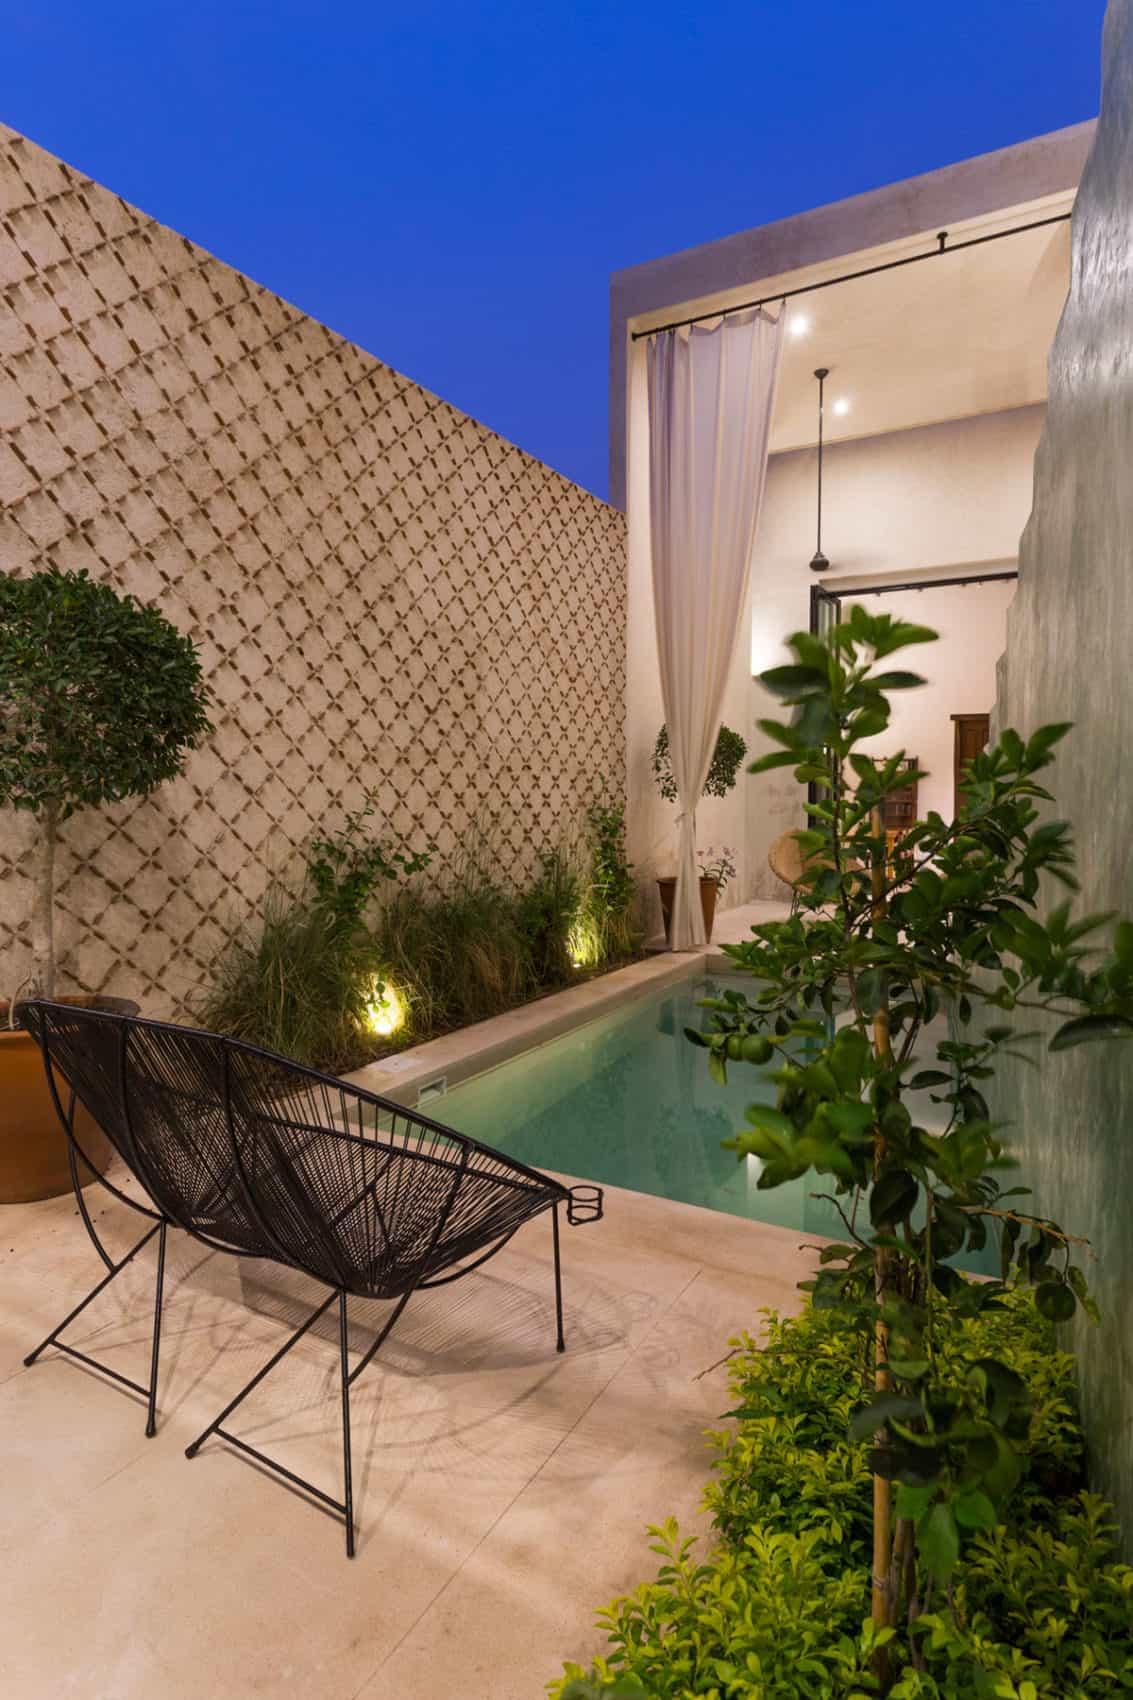 Casa del Limonero by Taller Estilo Arquitectura (17)